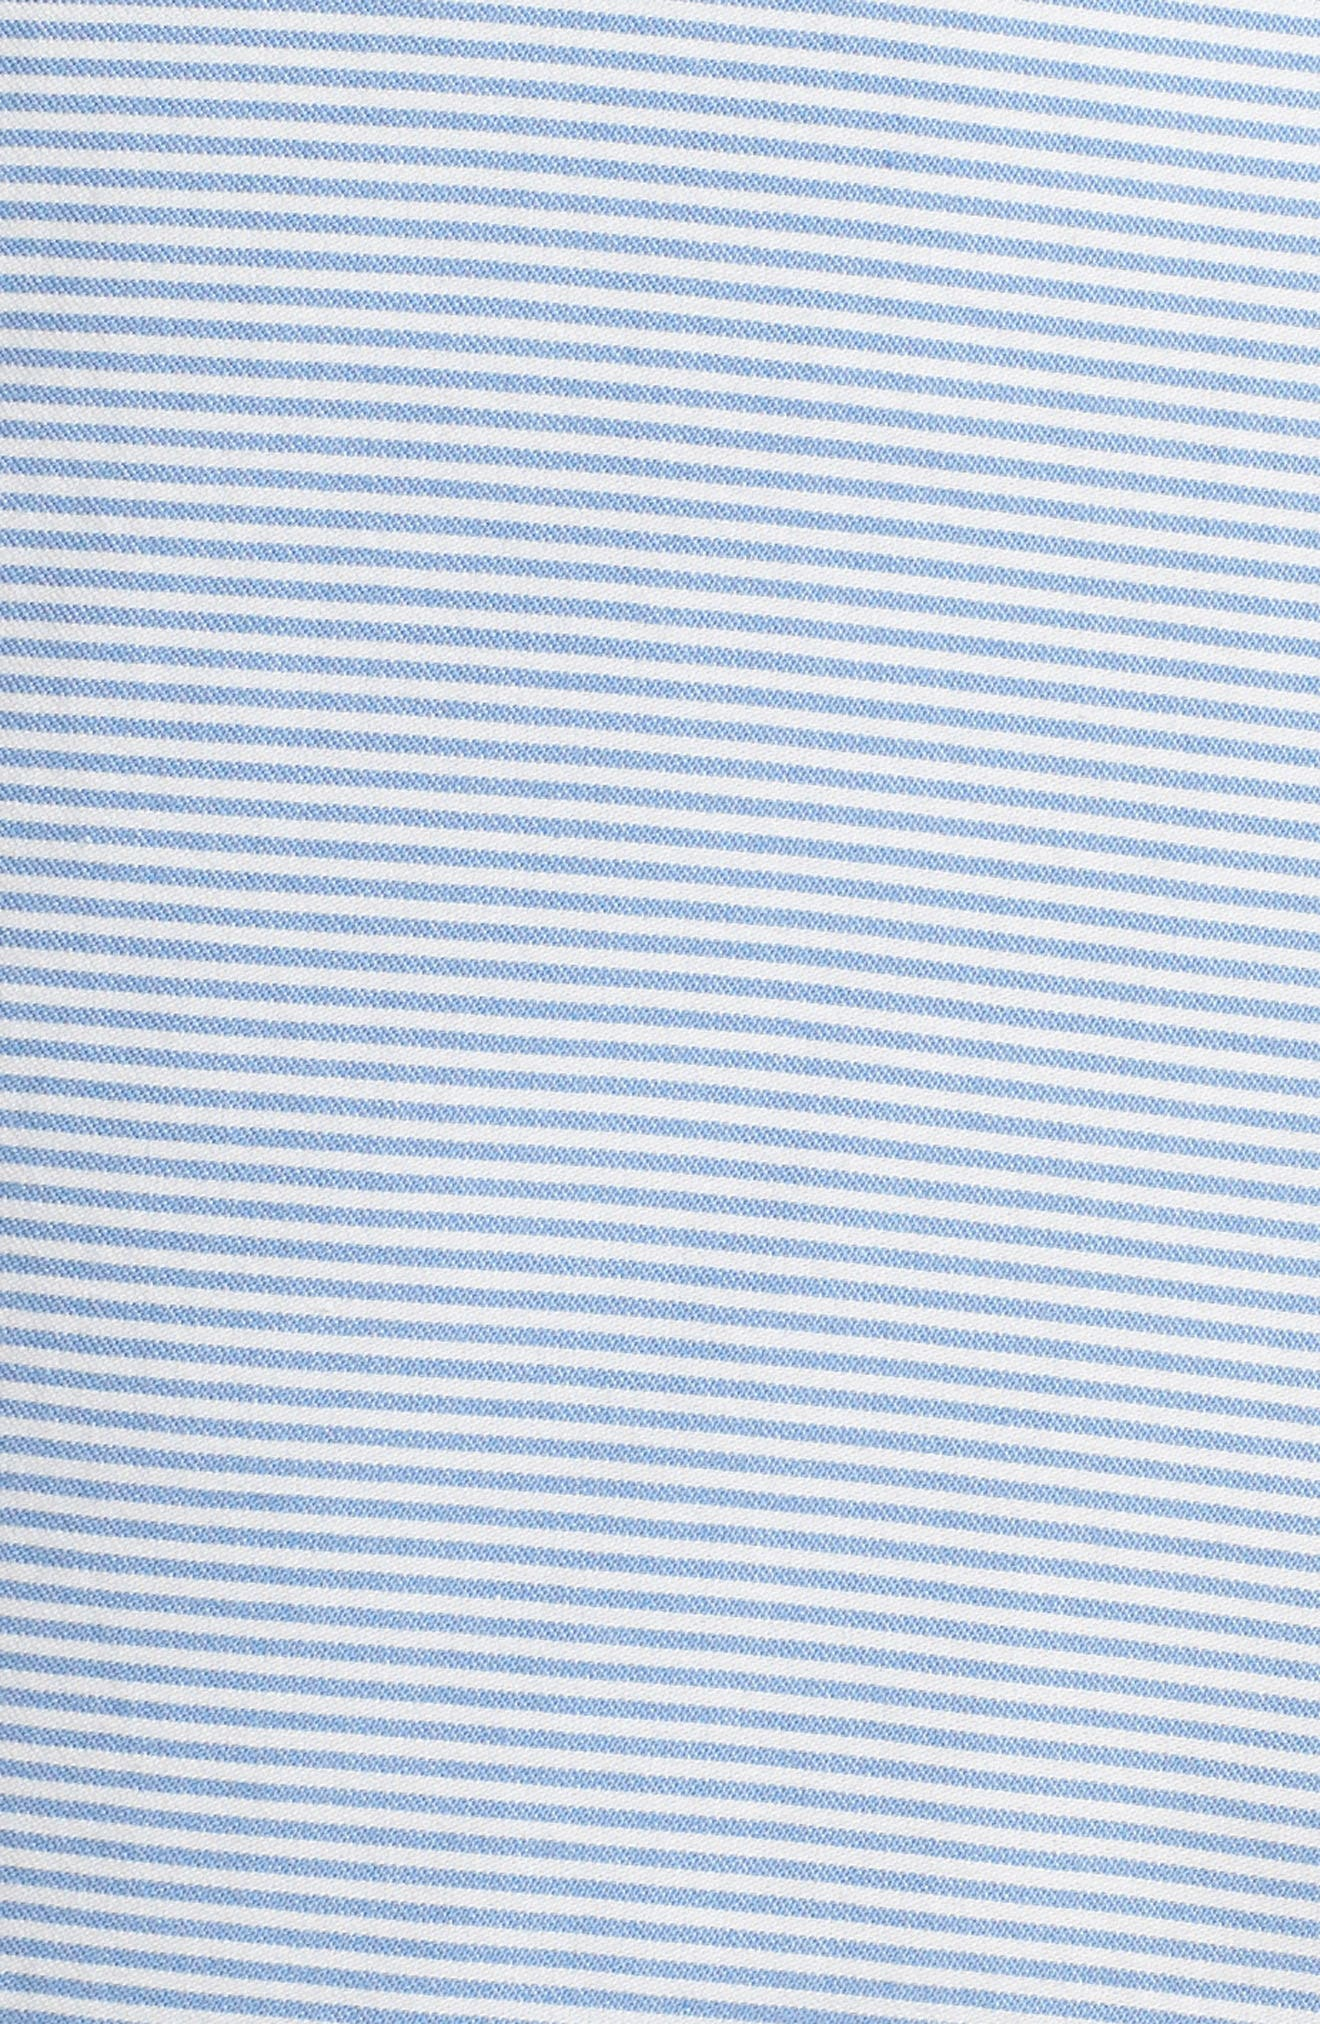 Geordy Regular Fit Pinstripe Shorts,                             Alternate thumbnail 5, color,                             400